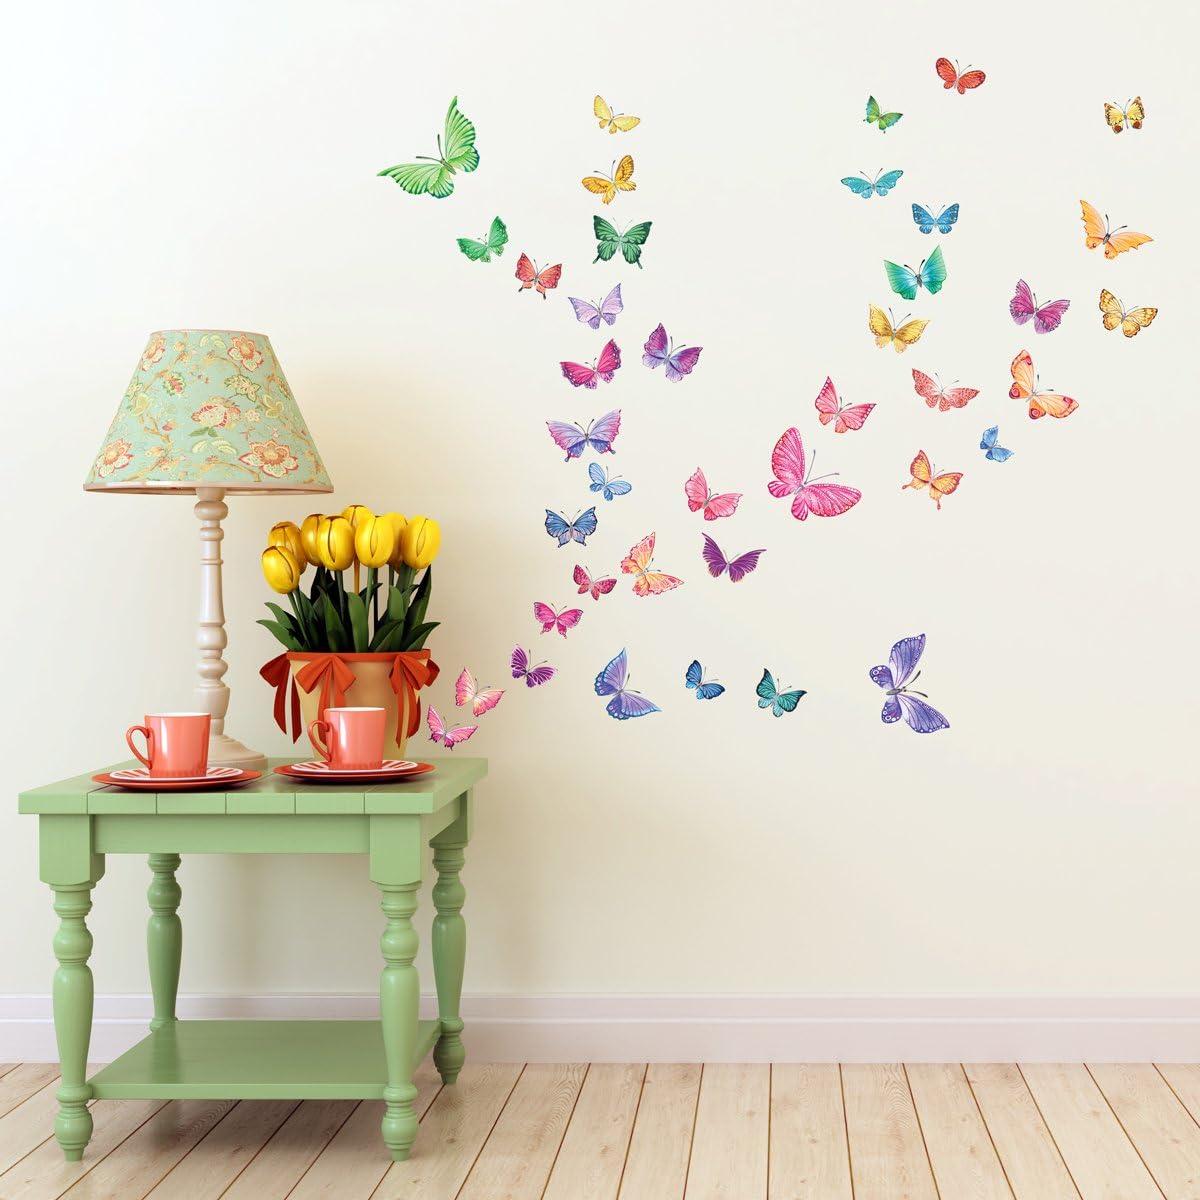 211n Wall Sticker Butterflies